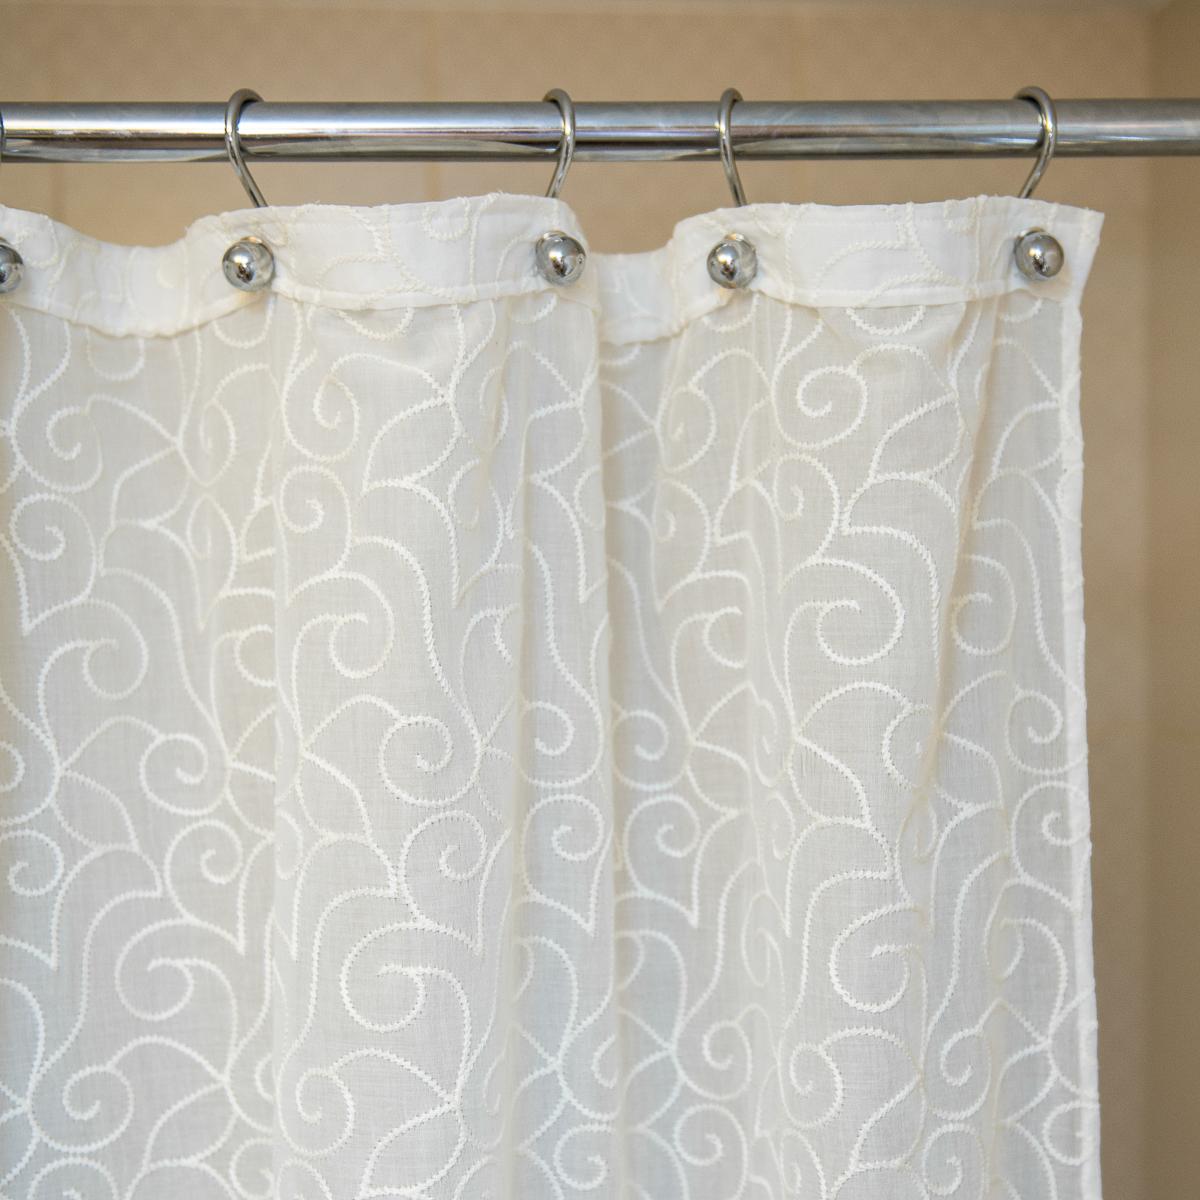 Шторки Шторка для ванной 200х300 Arti-Deco Embroidery 2555 elitnaya-shtorka-dlya-vannoy-300h200-embroidery-2555-ot-arti-deco-ispaniya.jpg